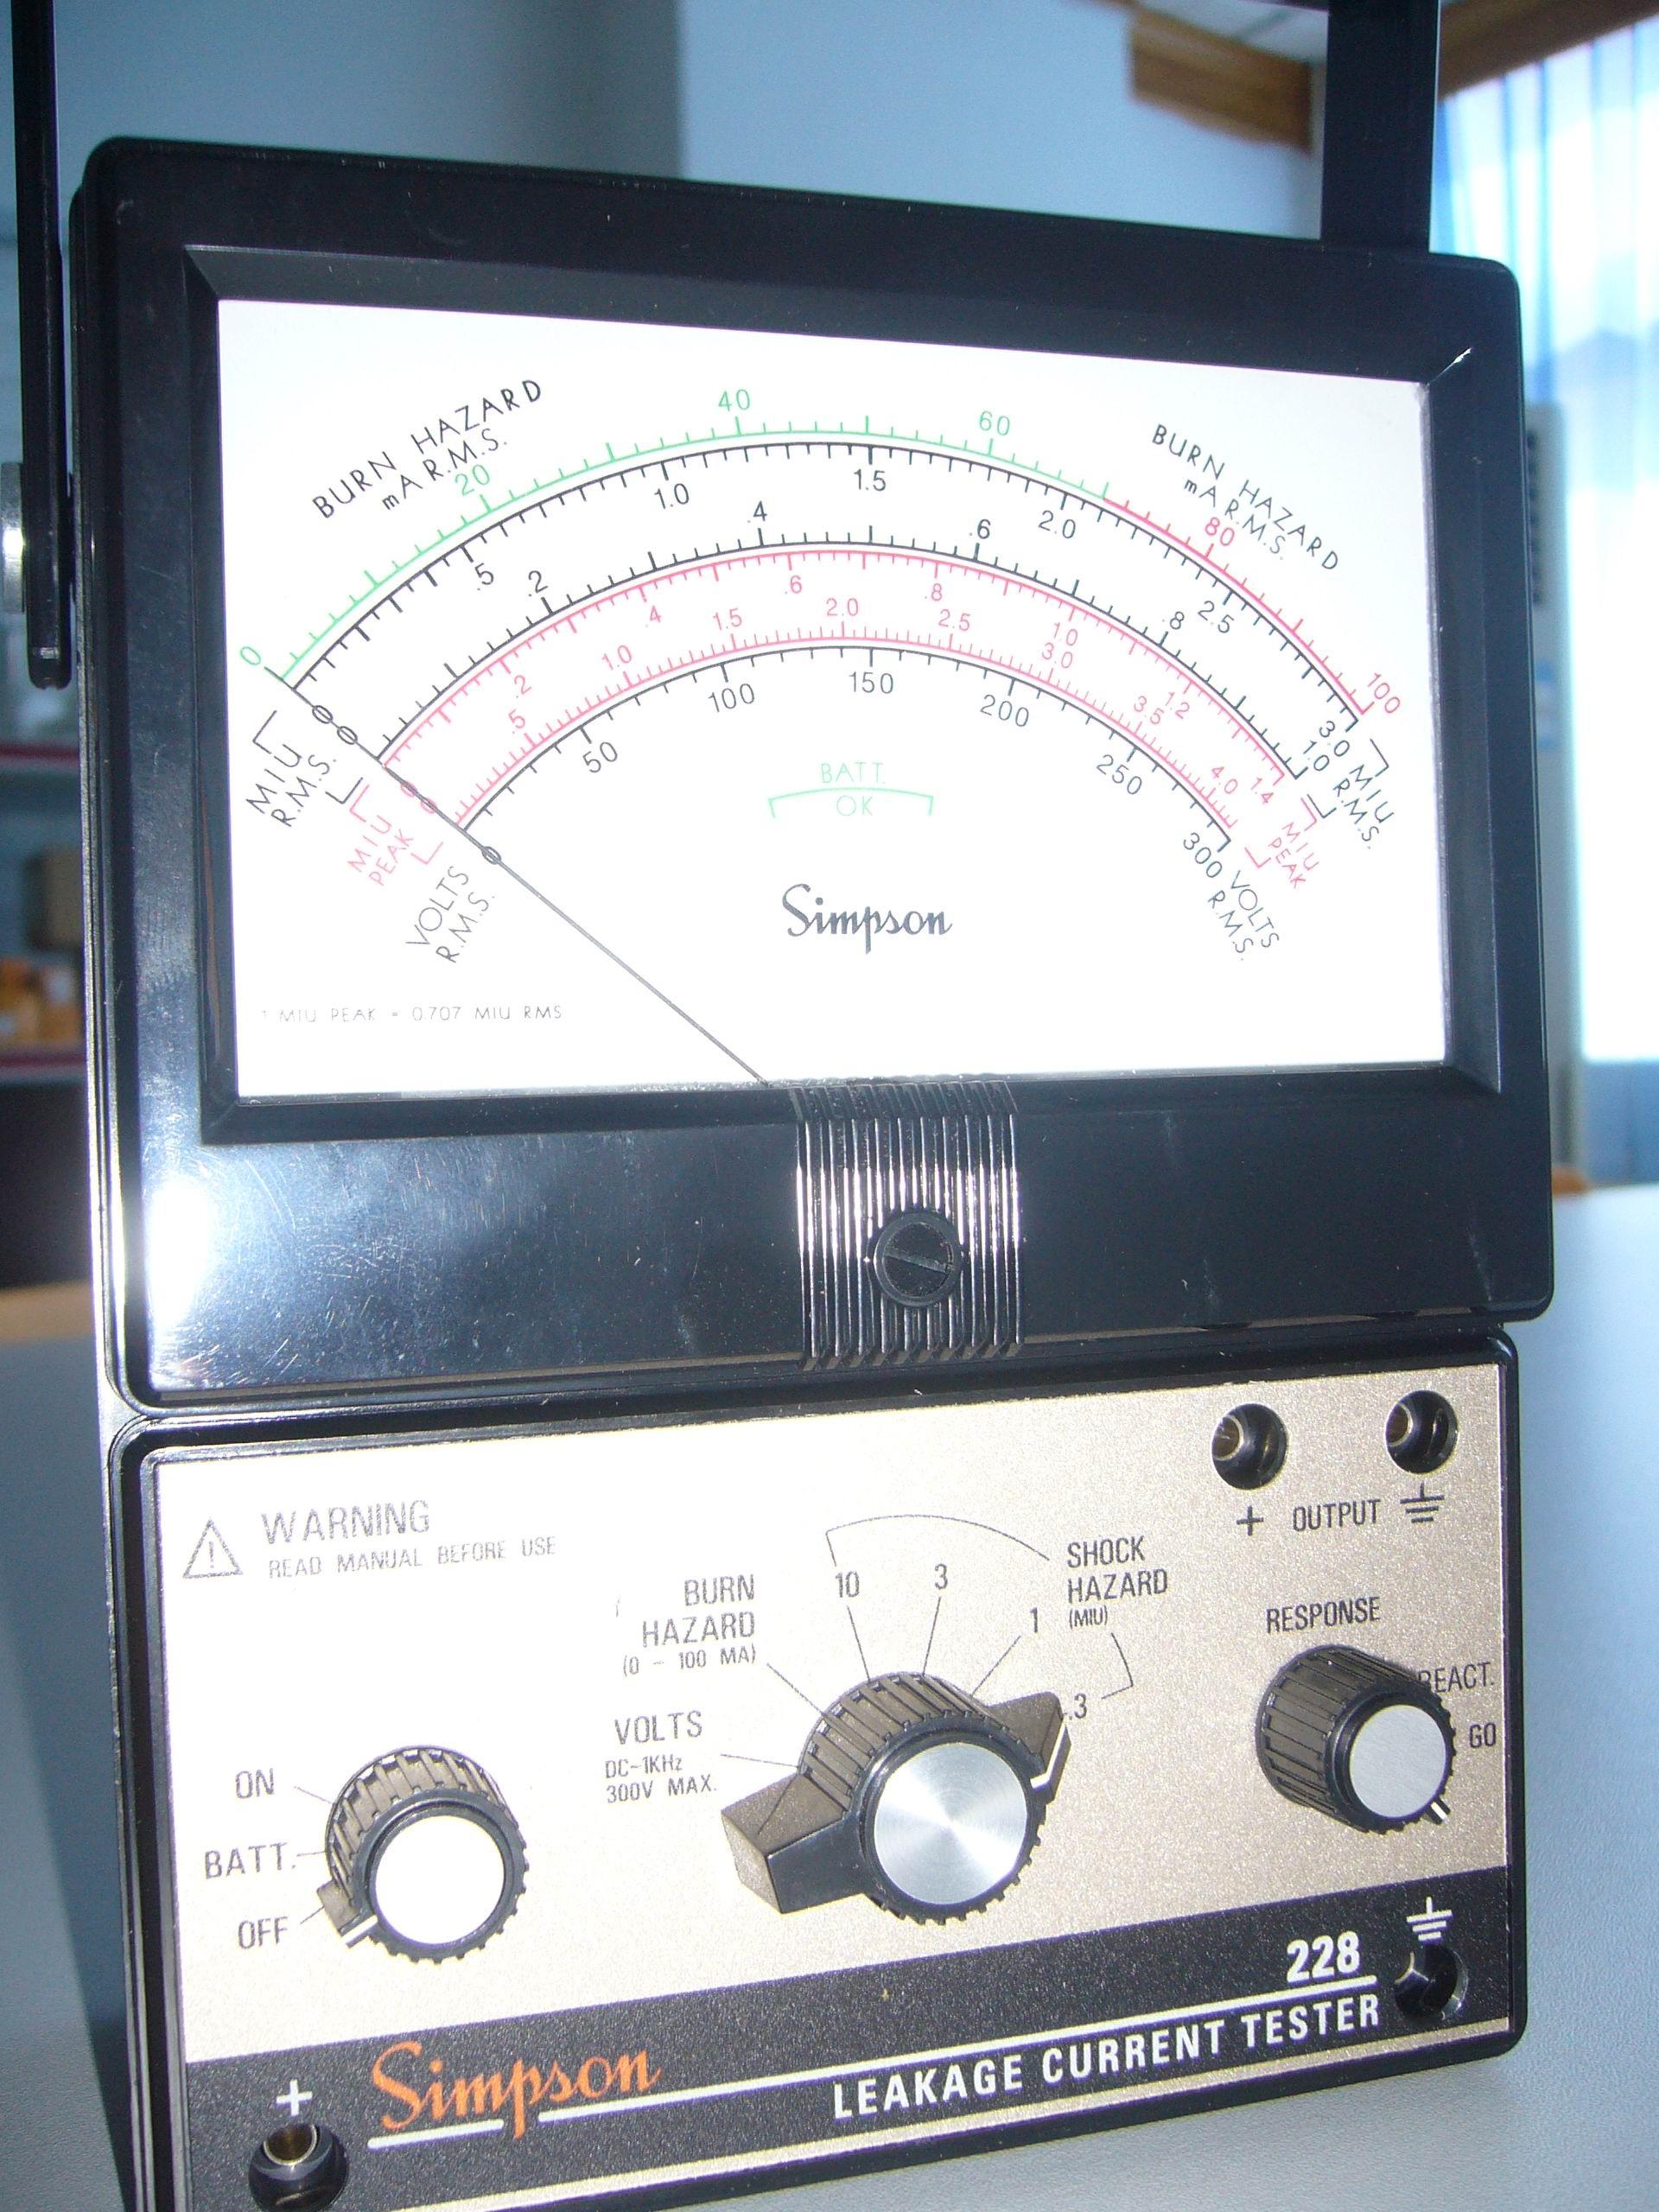 Simpson仪器仪表